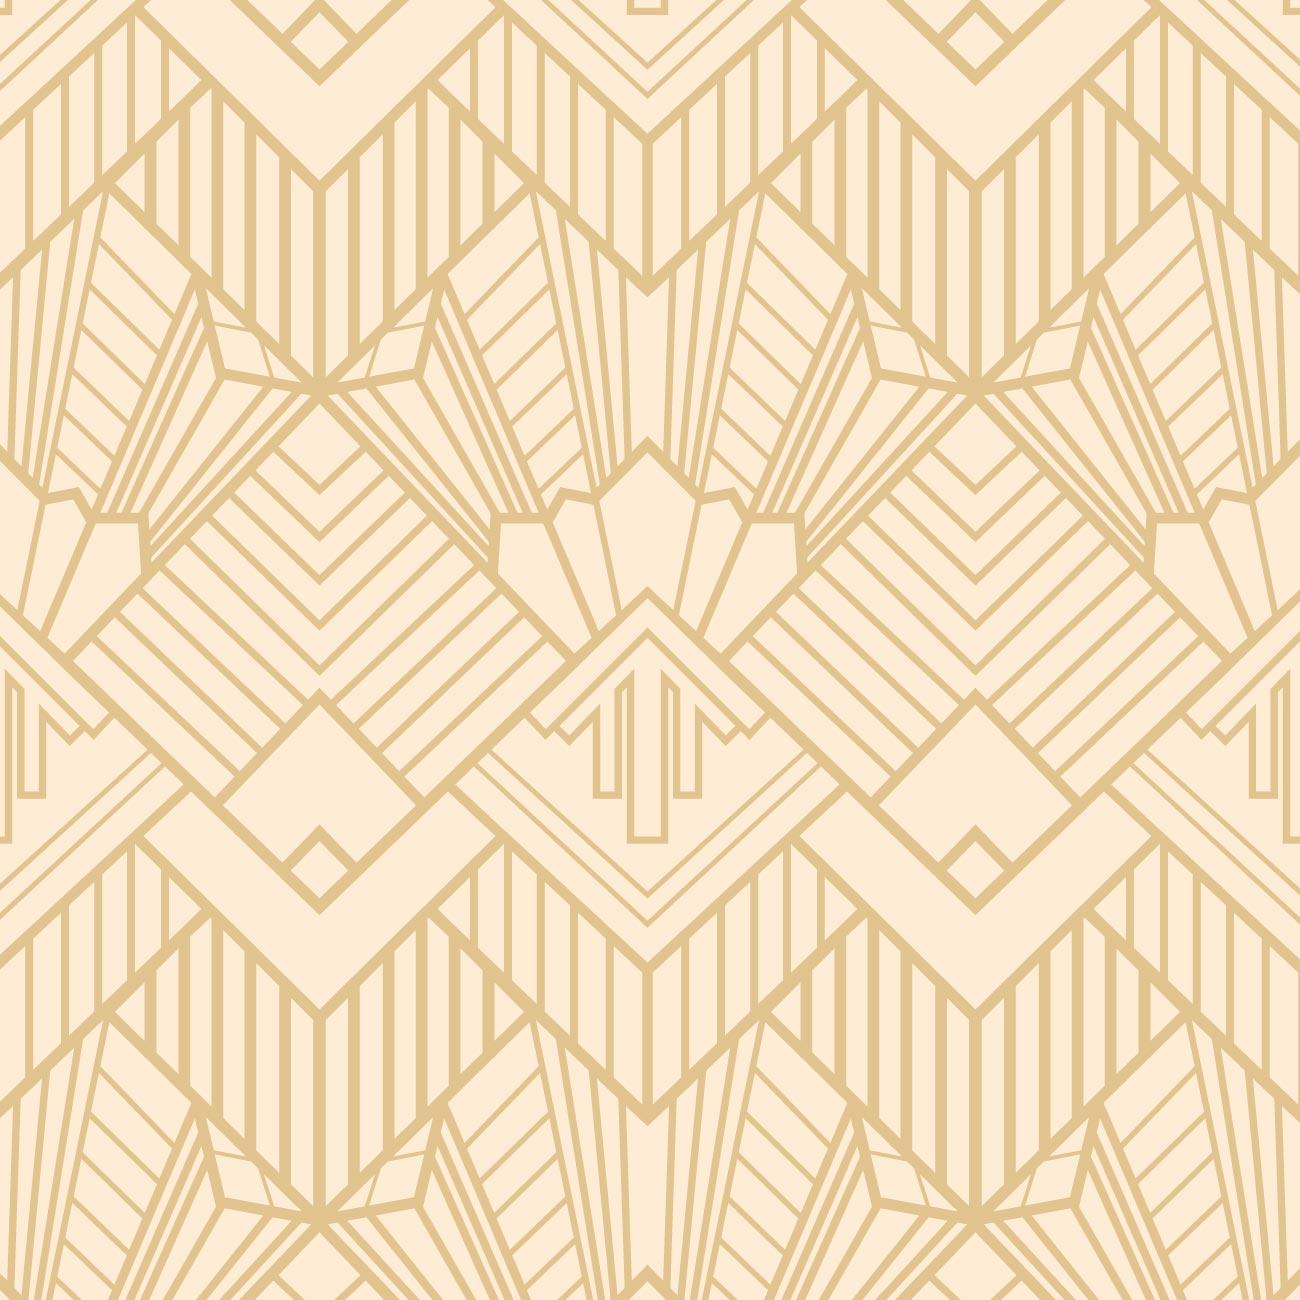 Designer Wallpaper Feature Wallpaper Designs Chameleon Collection Art Deco Hotel Modern Art Deco Art Deco Wallpaper